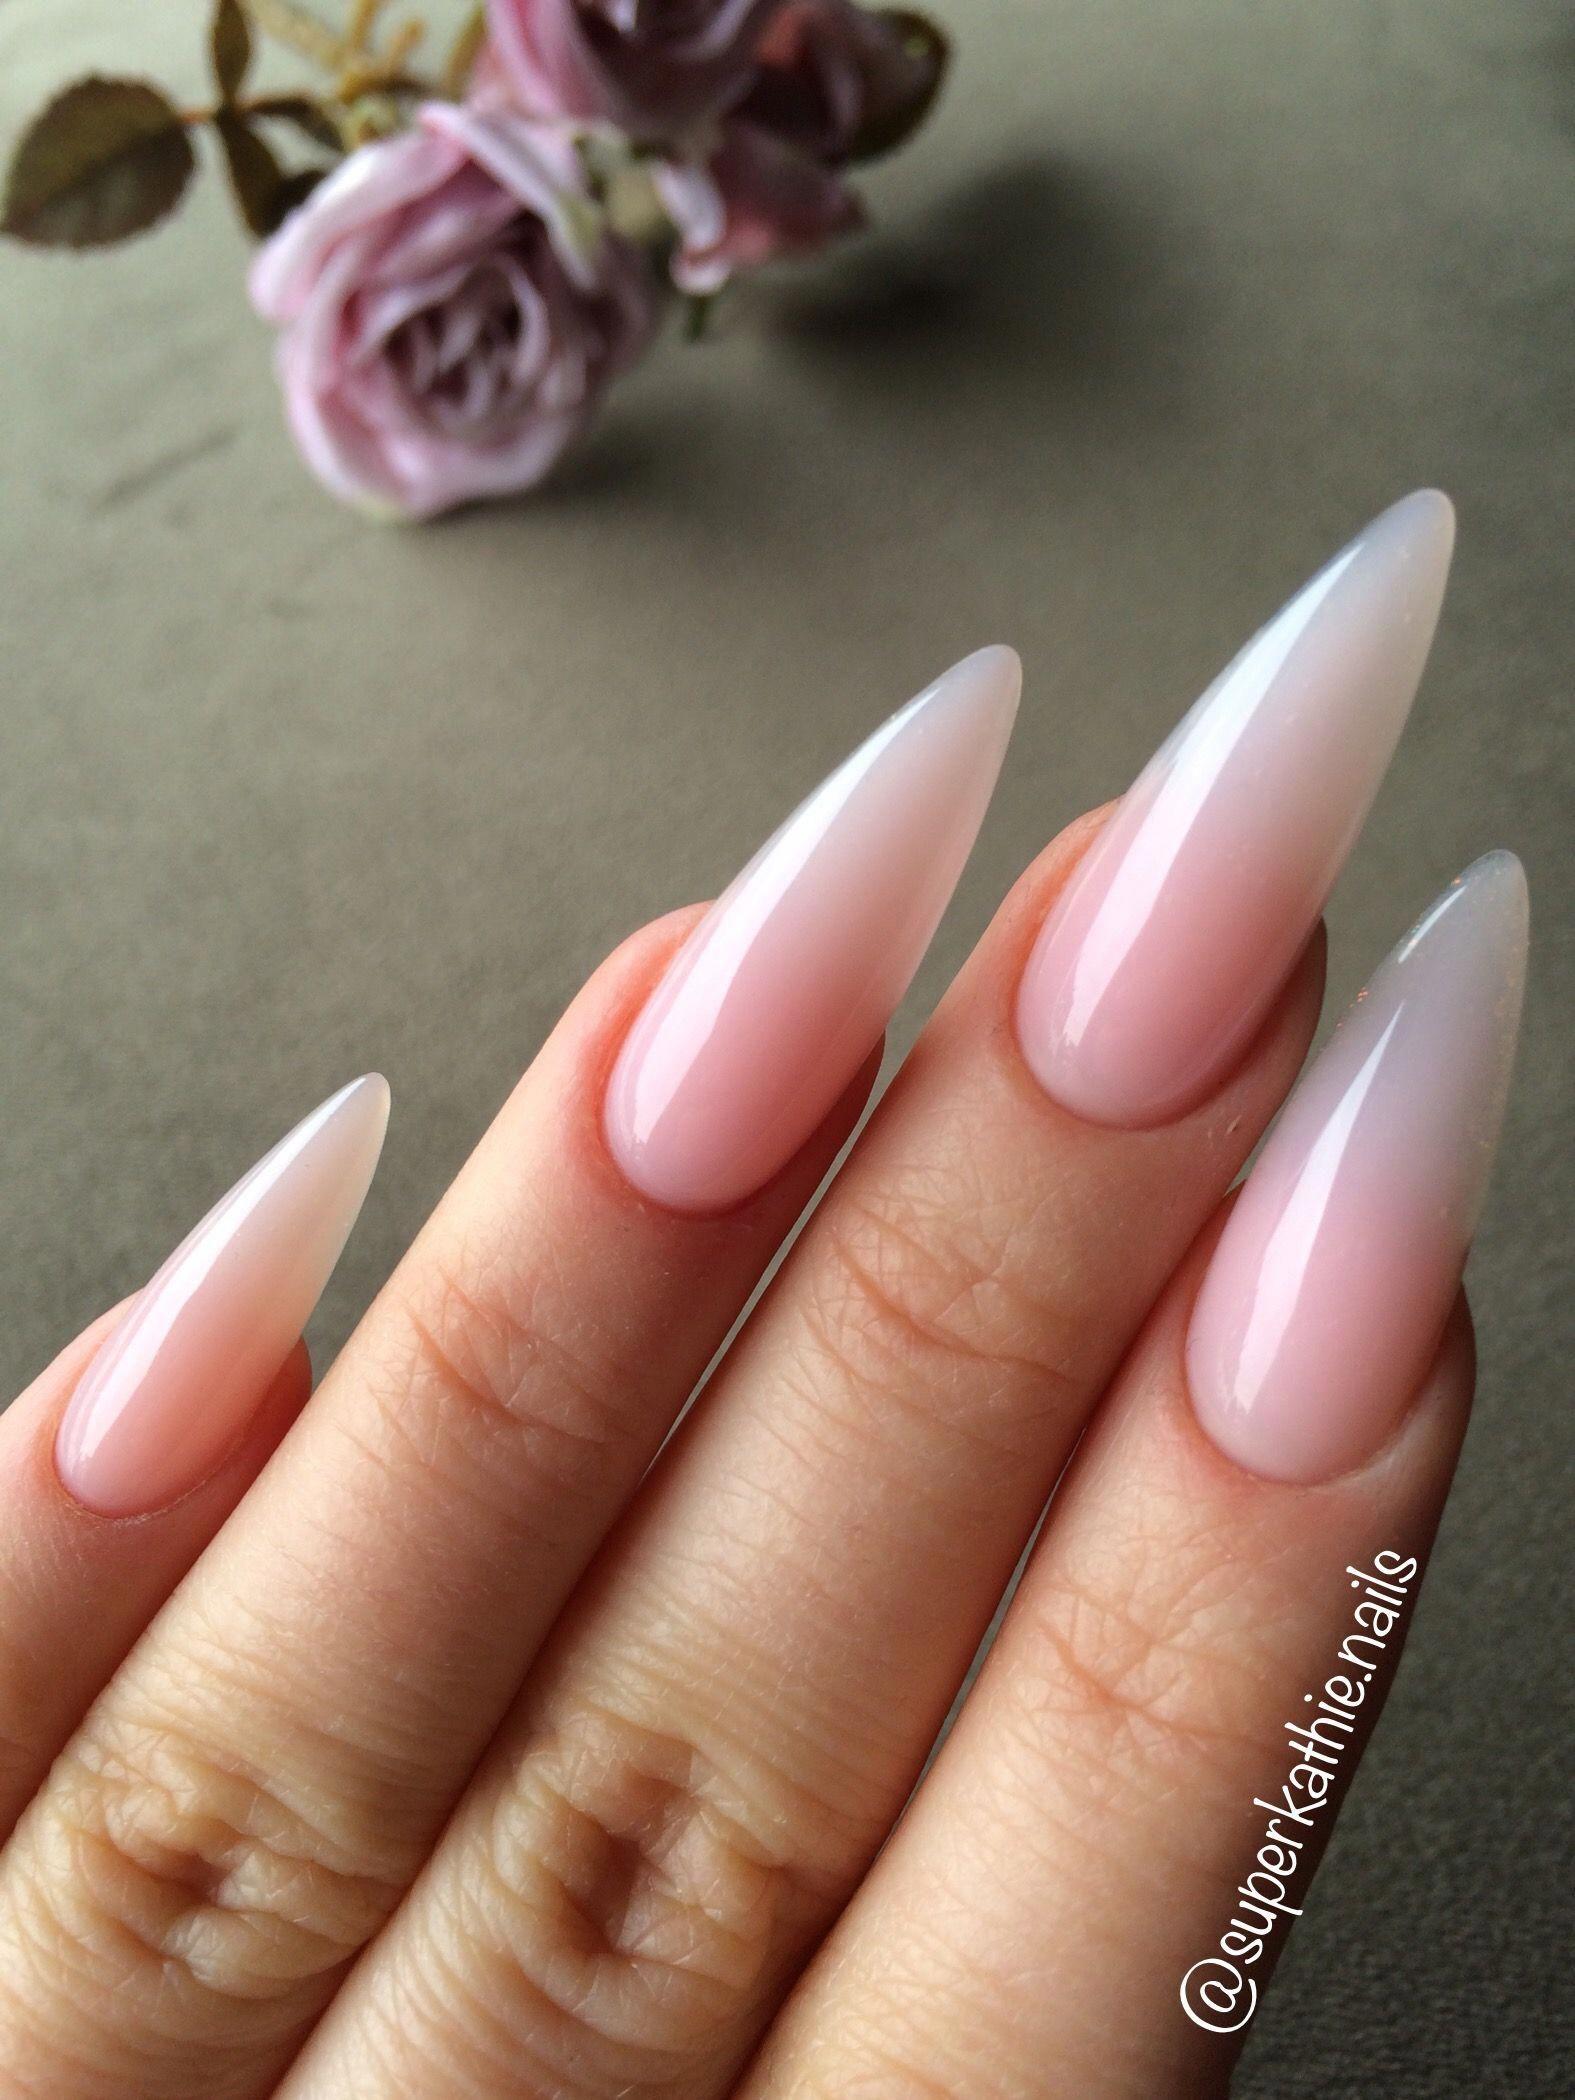 Acrylic Nail Art Ombre French Manicures Howlongdoacrylicnailslast Long Almond Nails Almond Acrylic Nails Long Nails